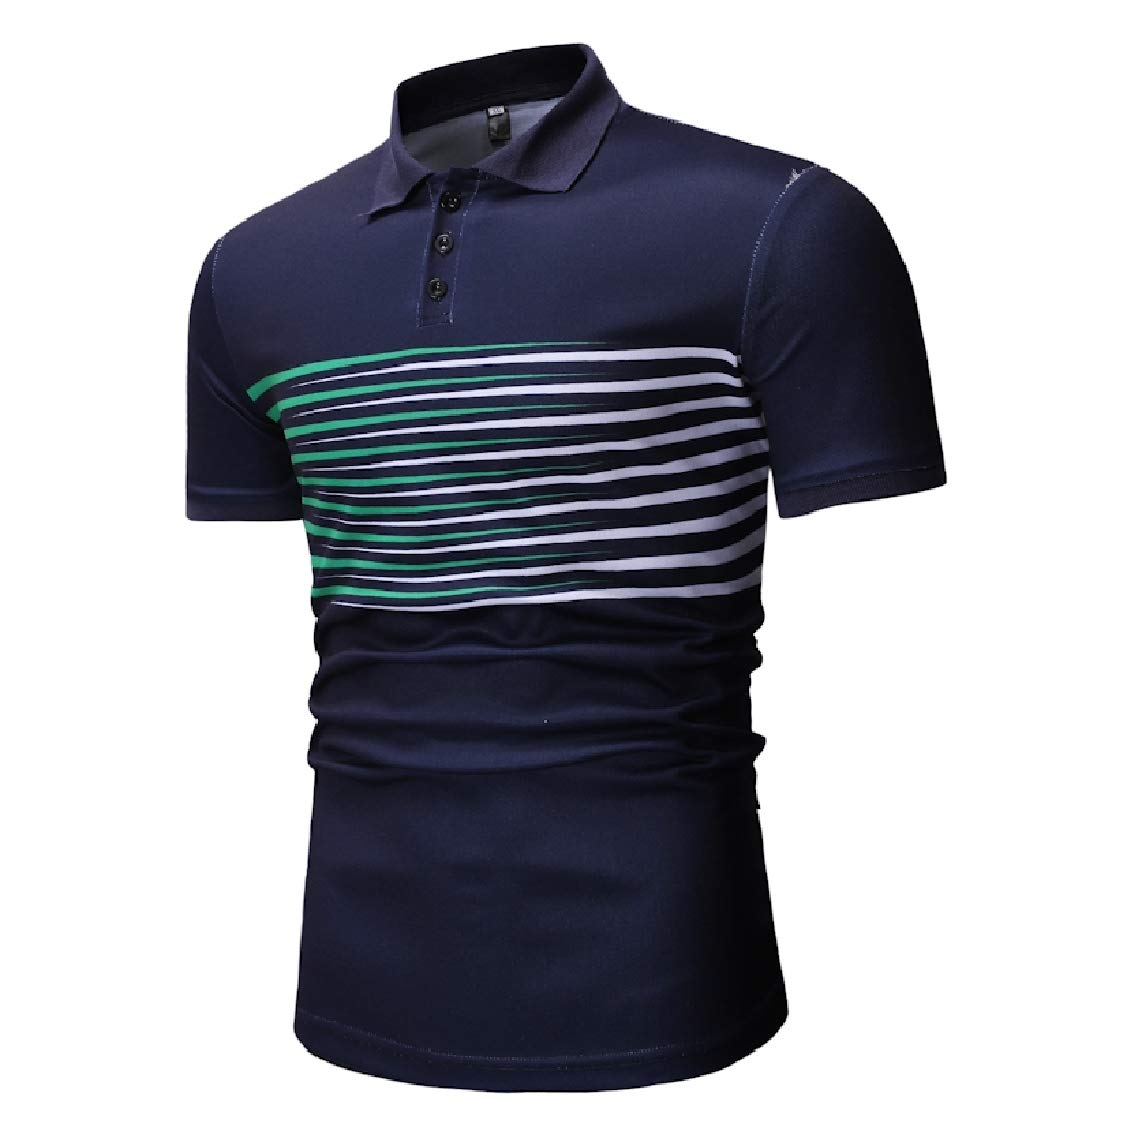 DressUMen Short Sleeve Lapel Gradient Plus-Size Striped Polo Shirt